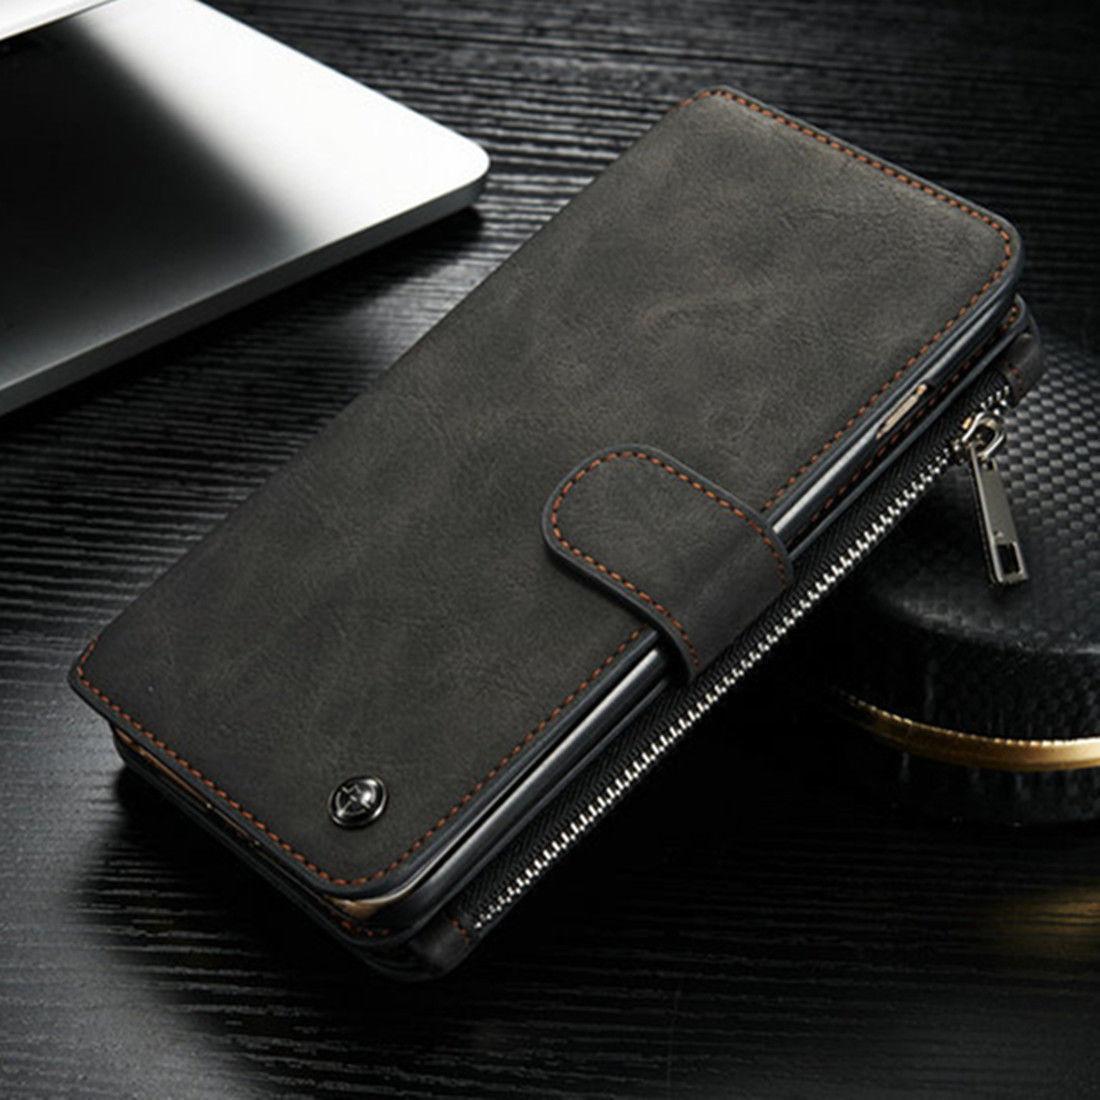 finest selection dba0e 50991 Flip Zipper Men Purse Wallet Leather Luxury Case For iPhone 5s SE 6 6s 7  Plus Card Slot Holder Bag Cover For Samsung S6 S7 Edge